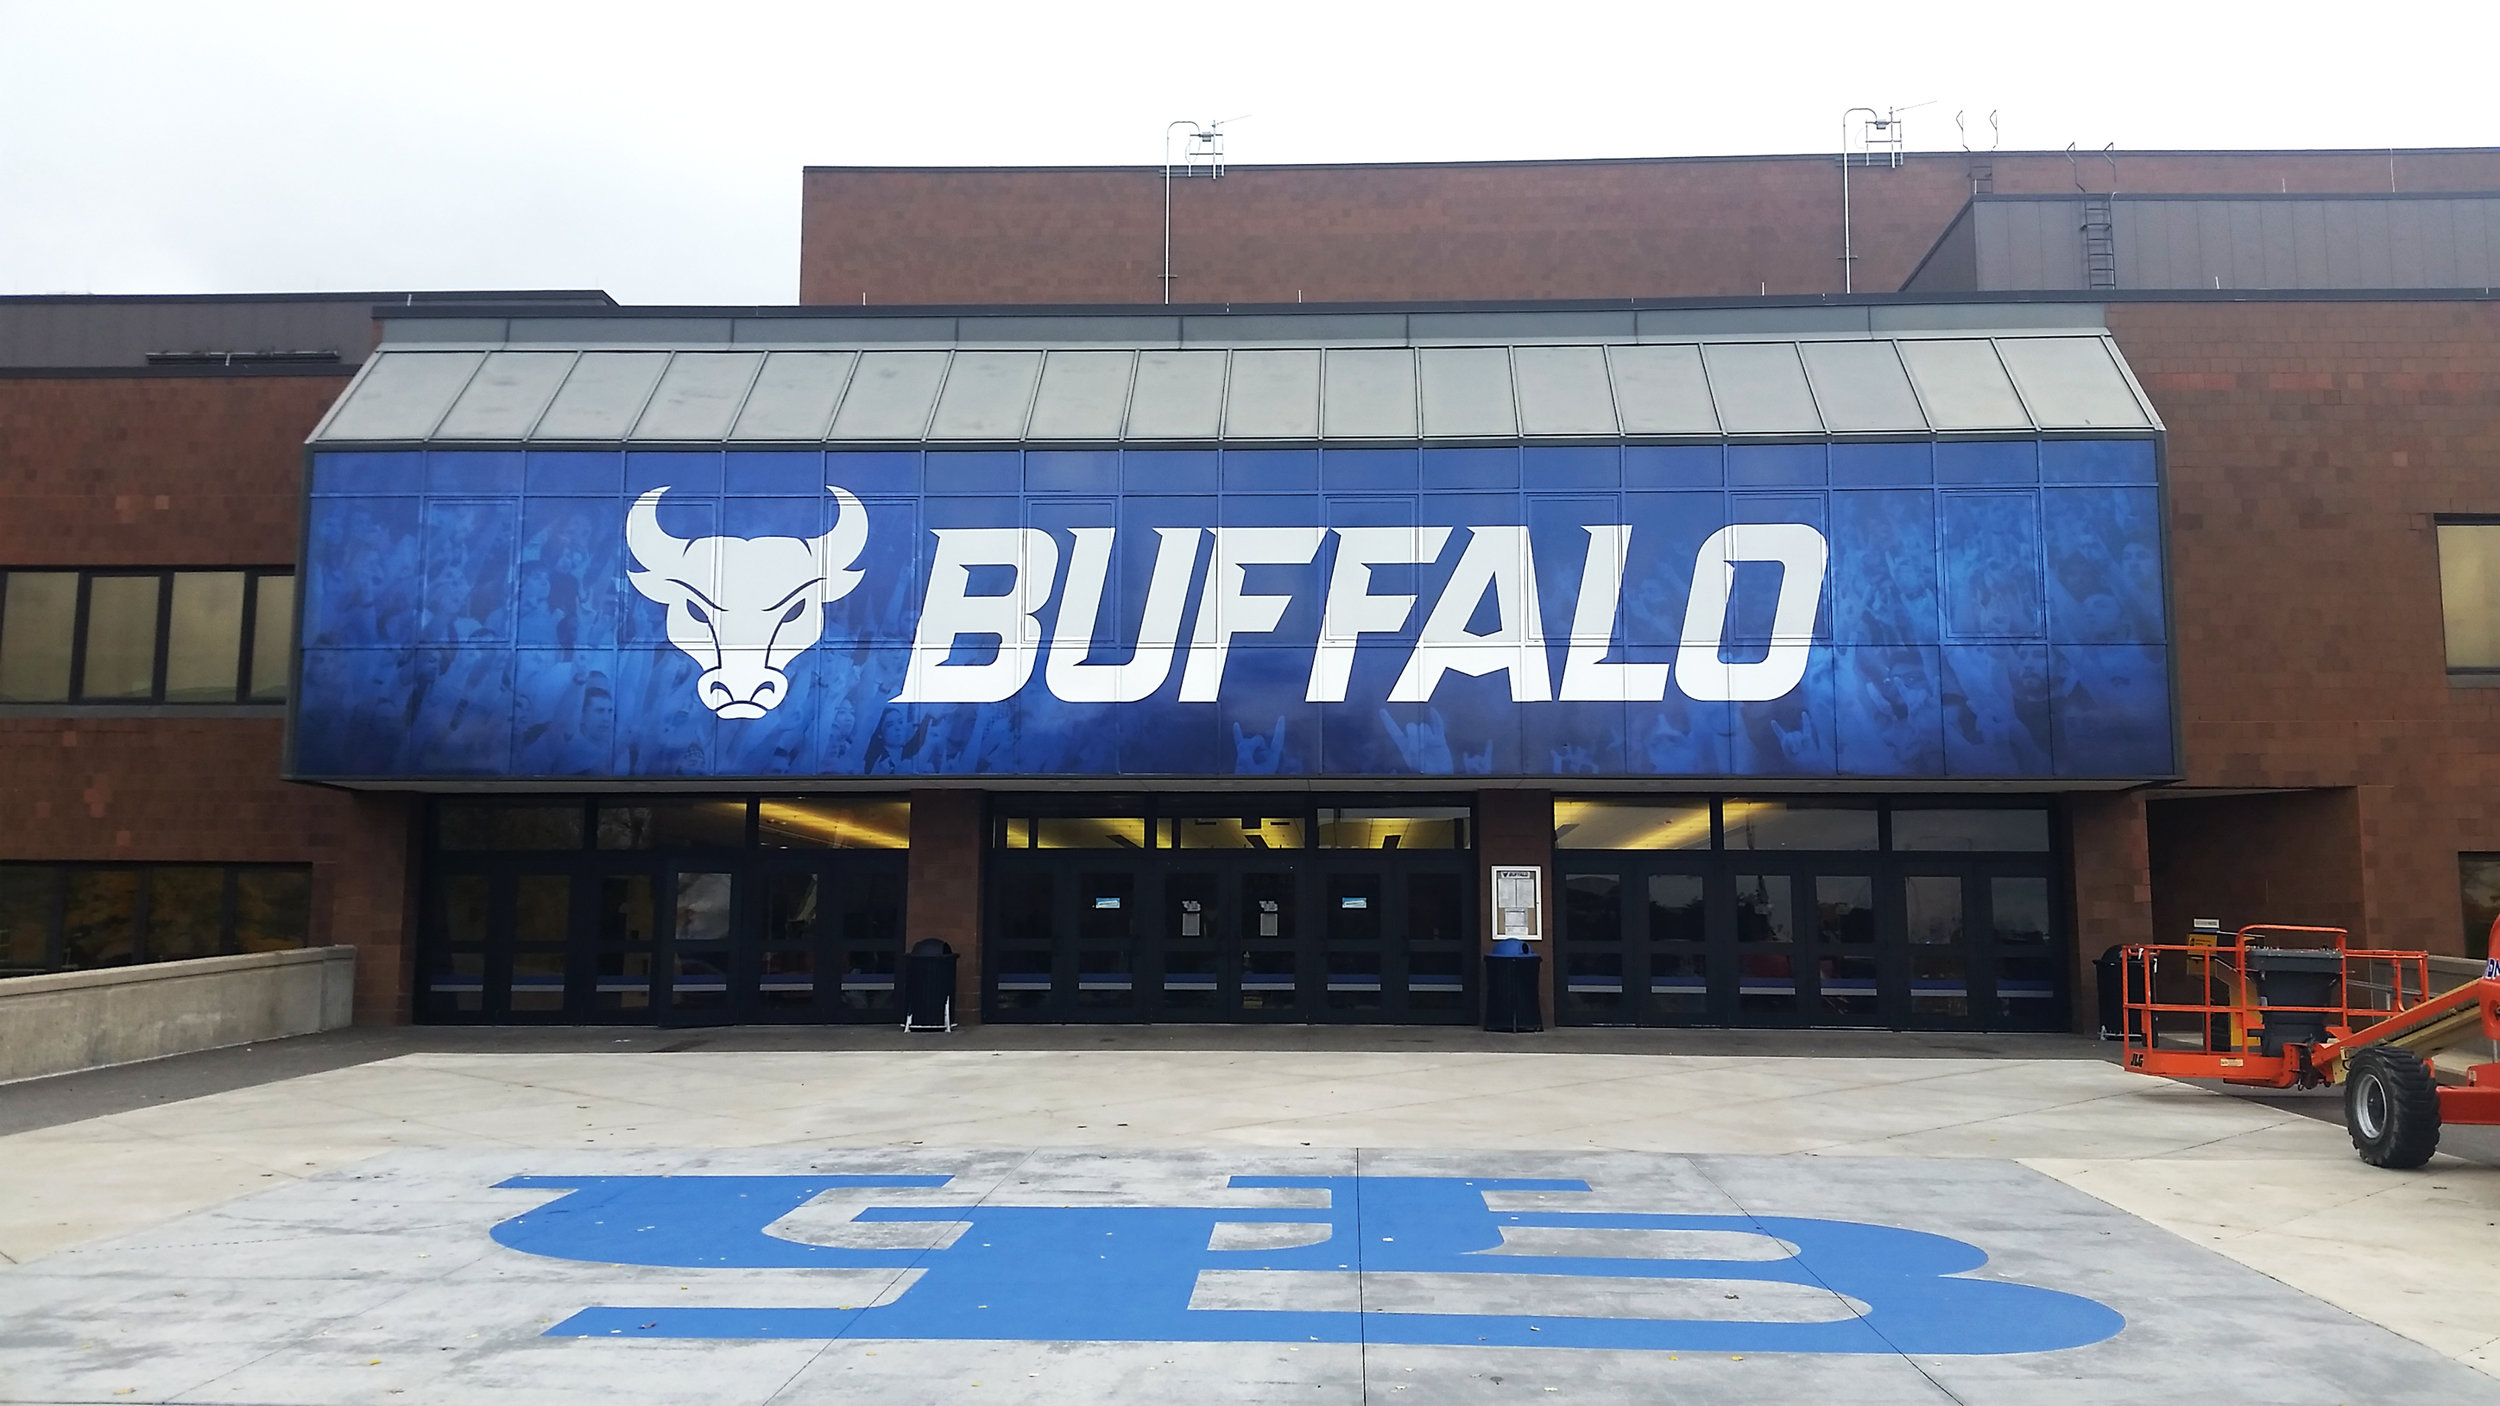 University at Buffalo - Alumni Arena Entrance Window Mural